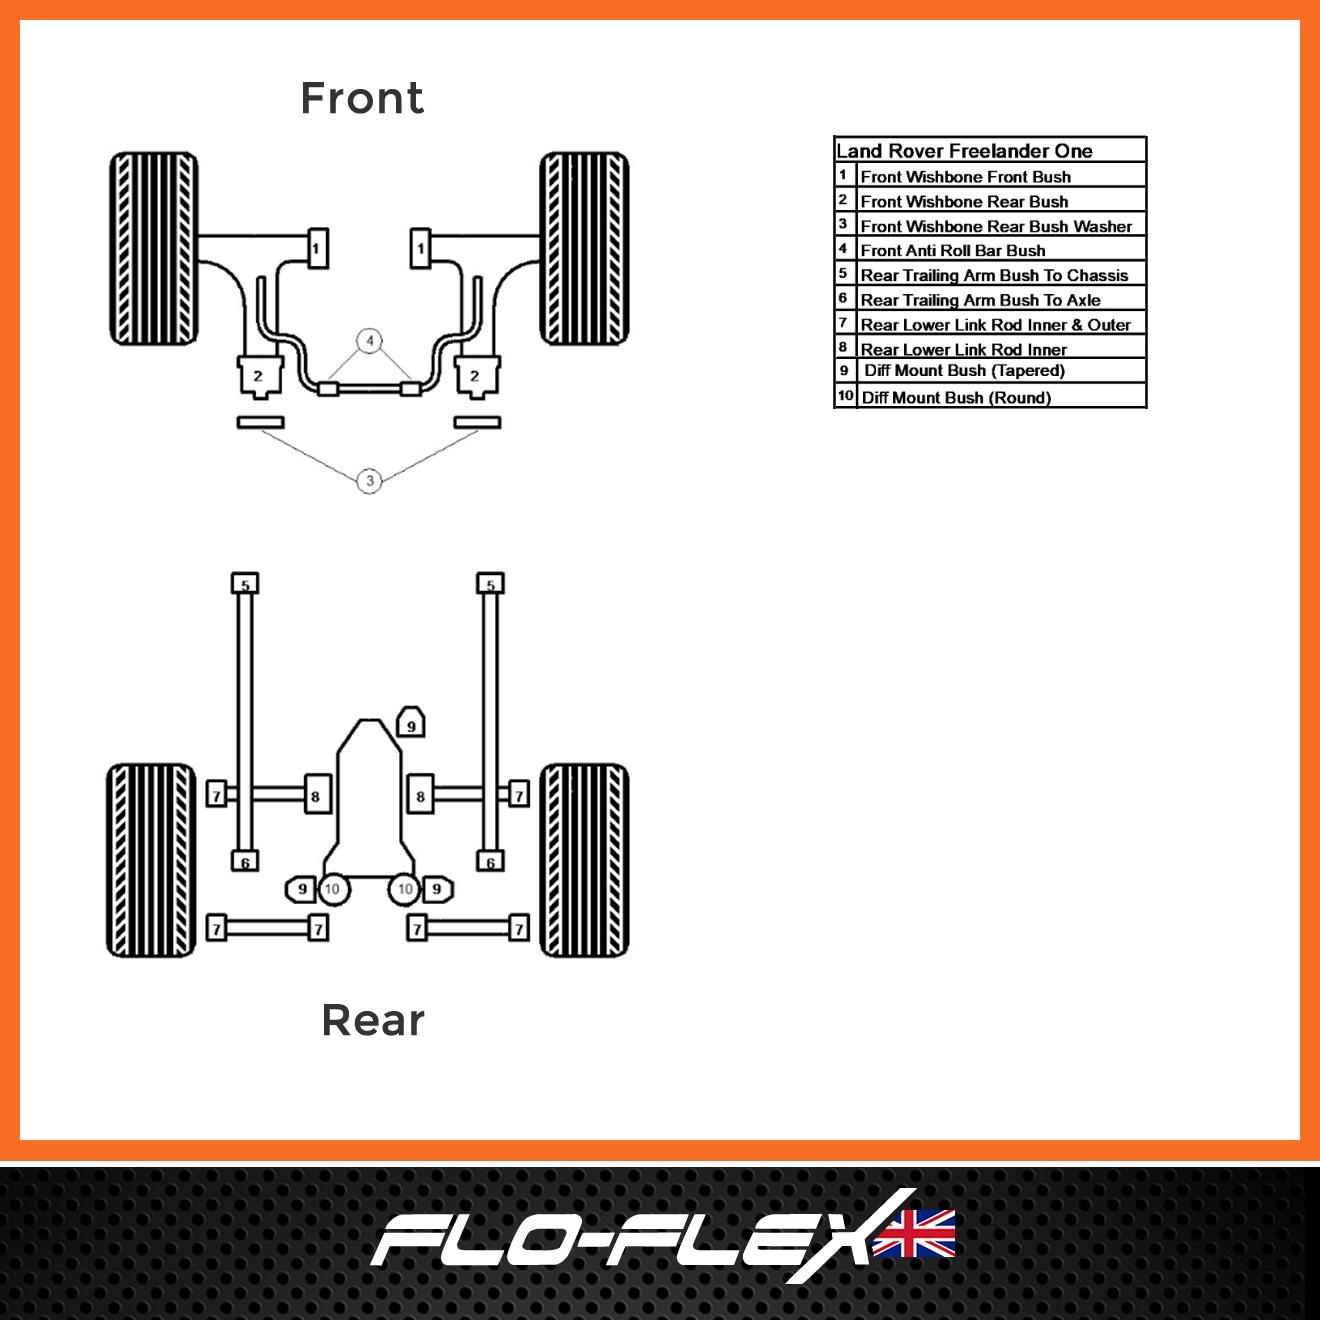 Brilliant Land Rover Freelander 1 Rear Diff Centre Mount Bush Floflex Wiring Digital Resources Indicompassionincorg